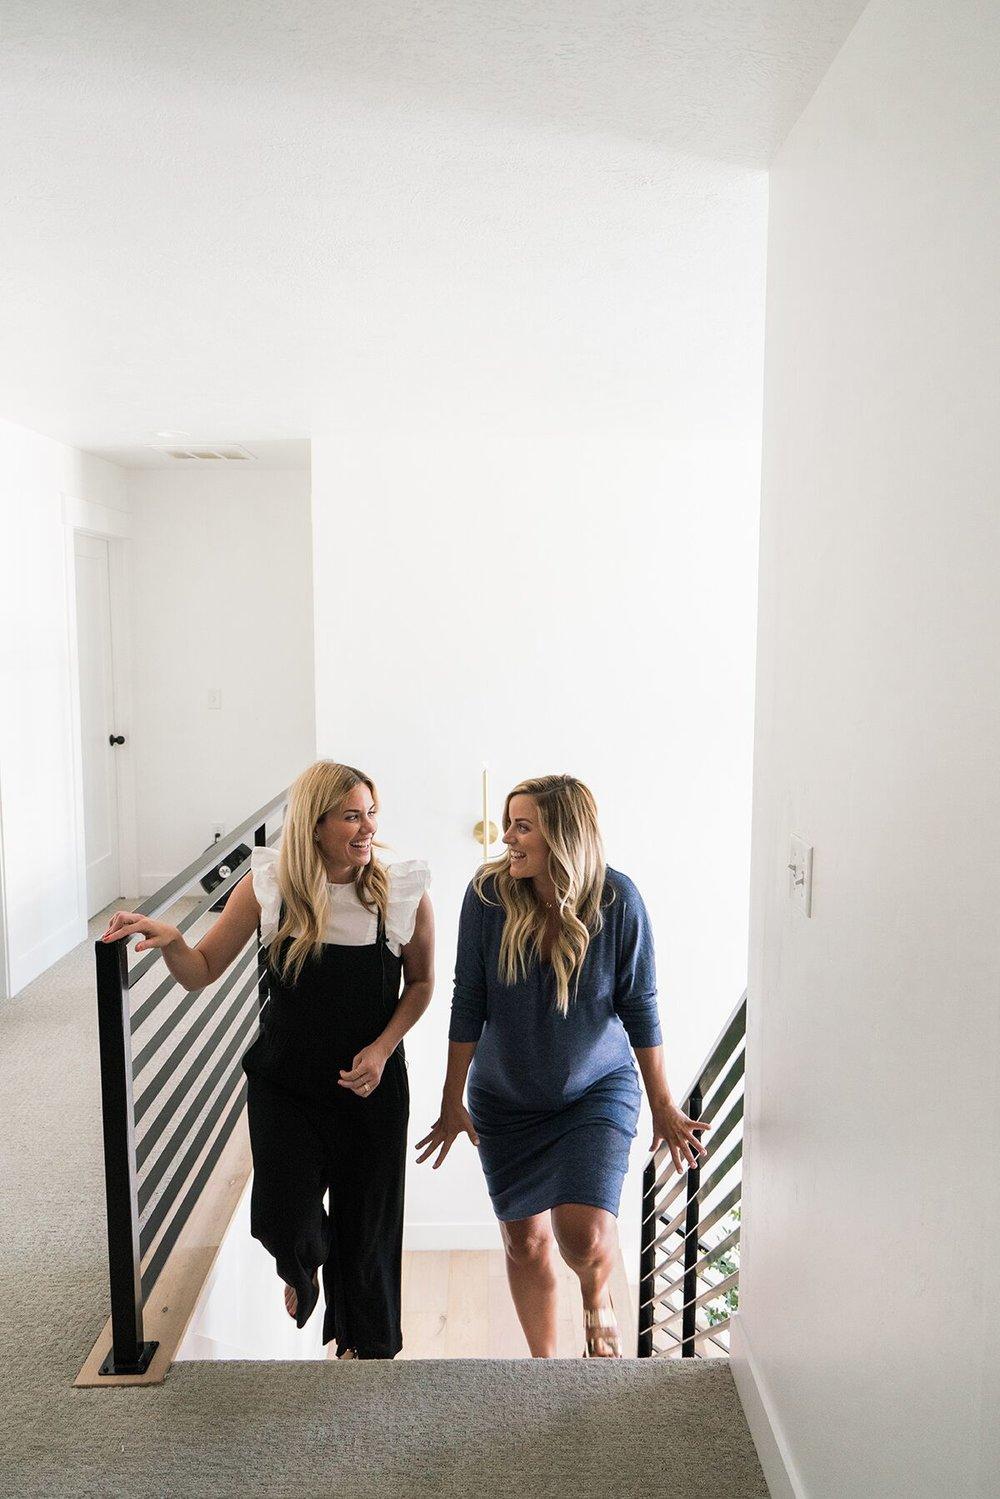 Jenna Rammell and Studio McGee